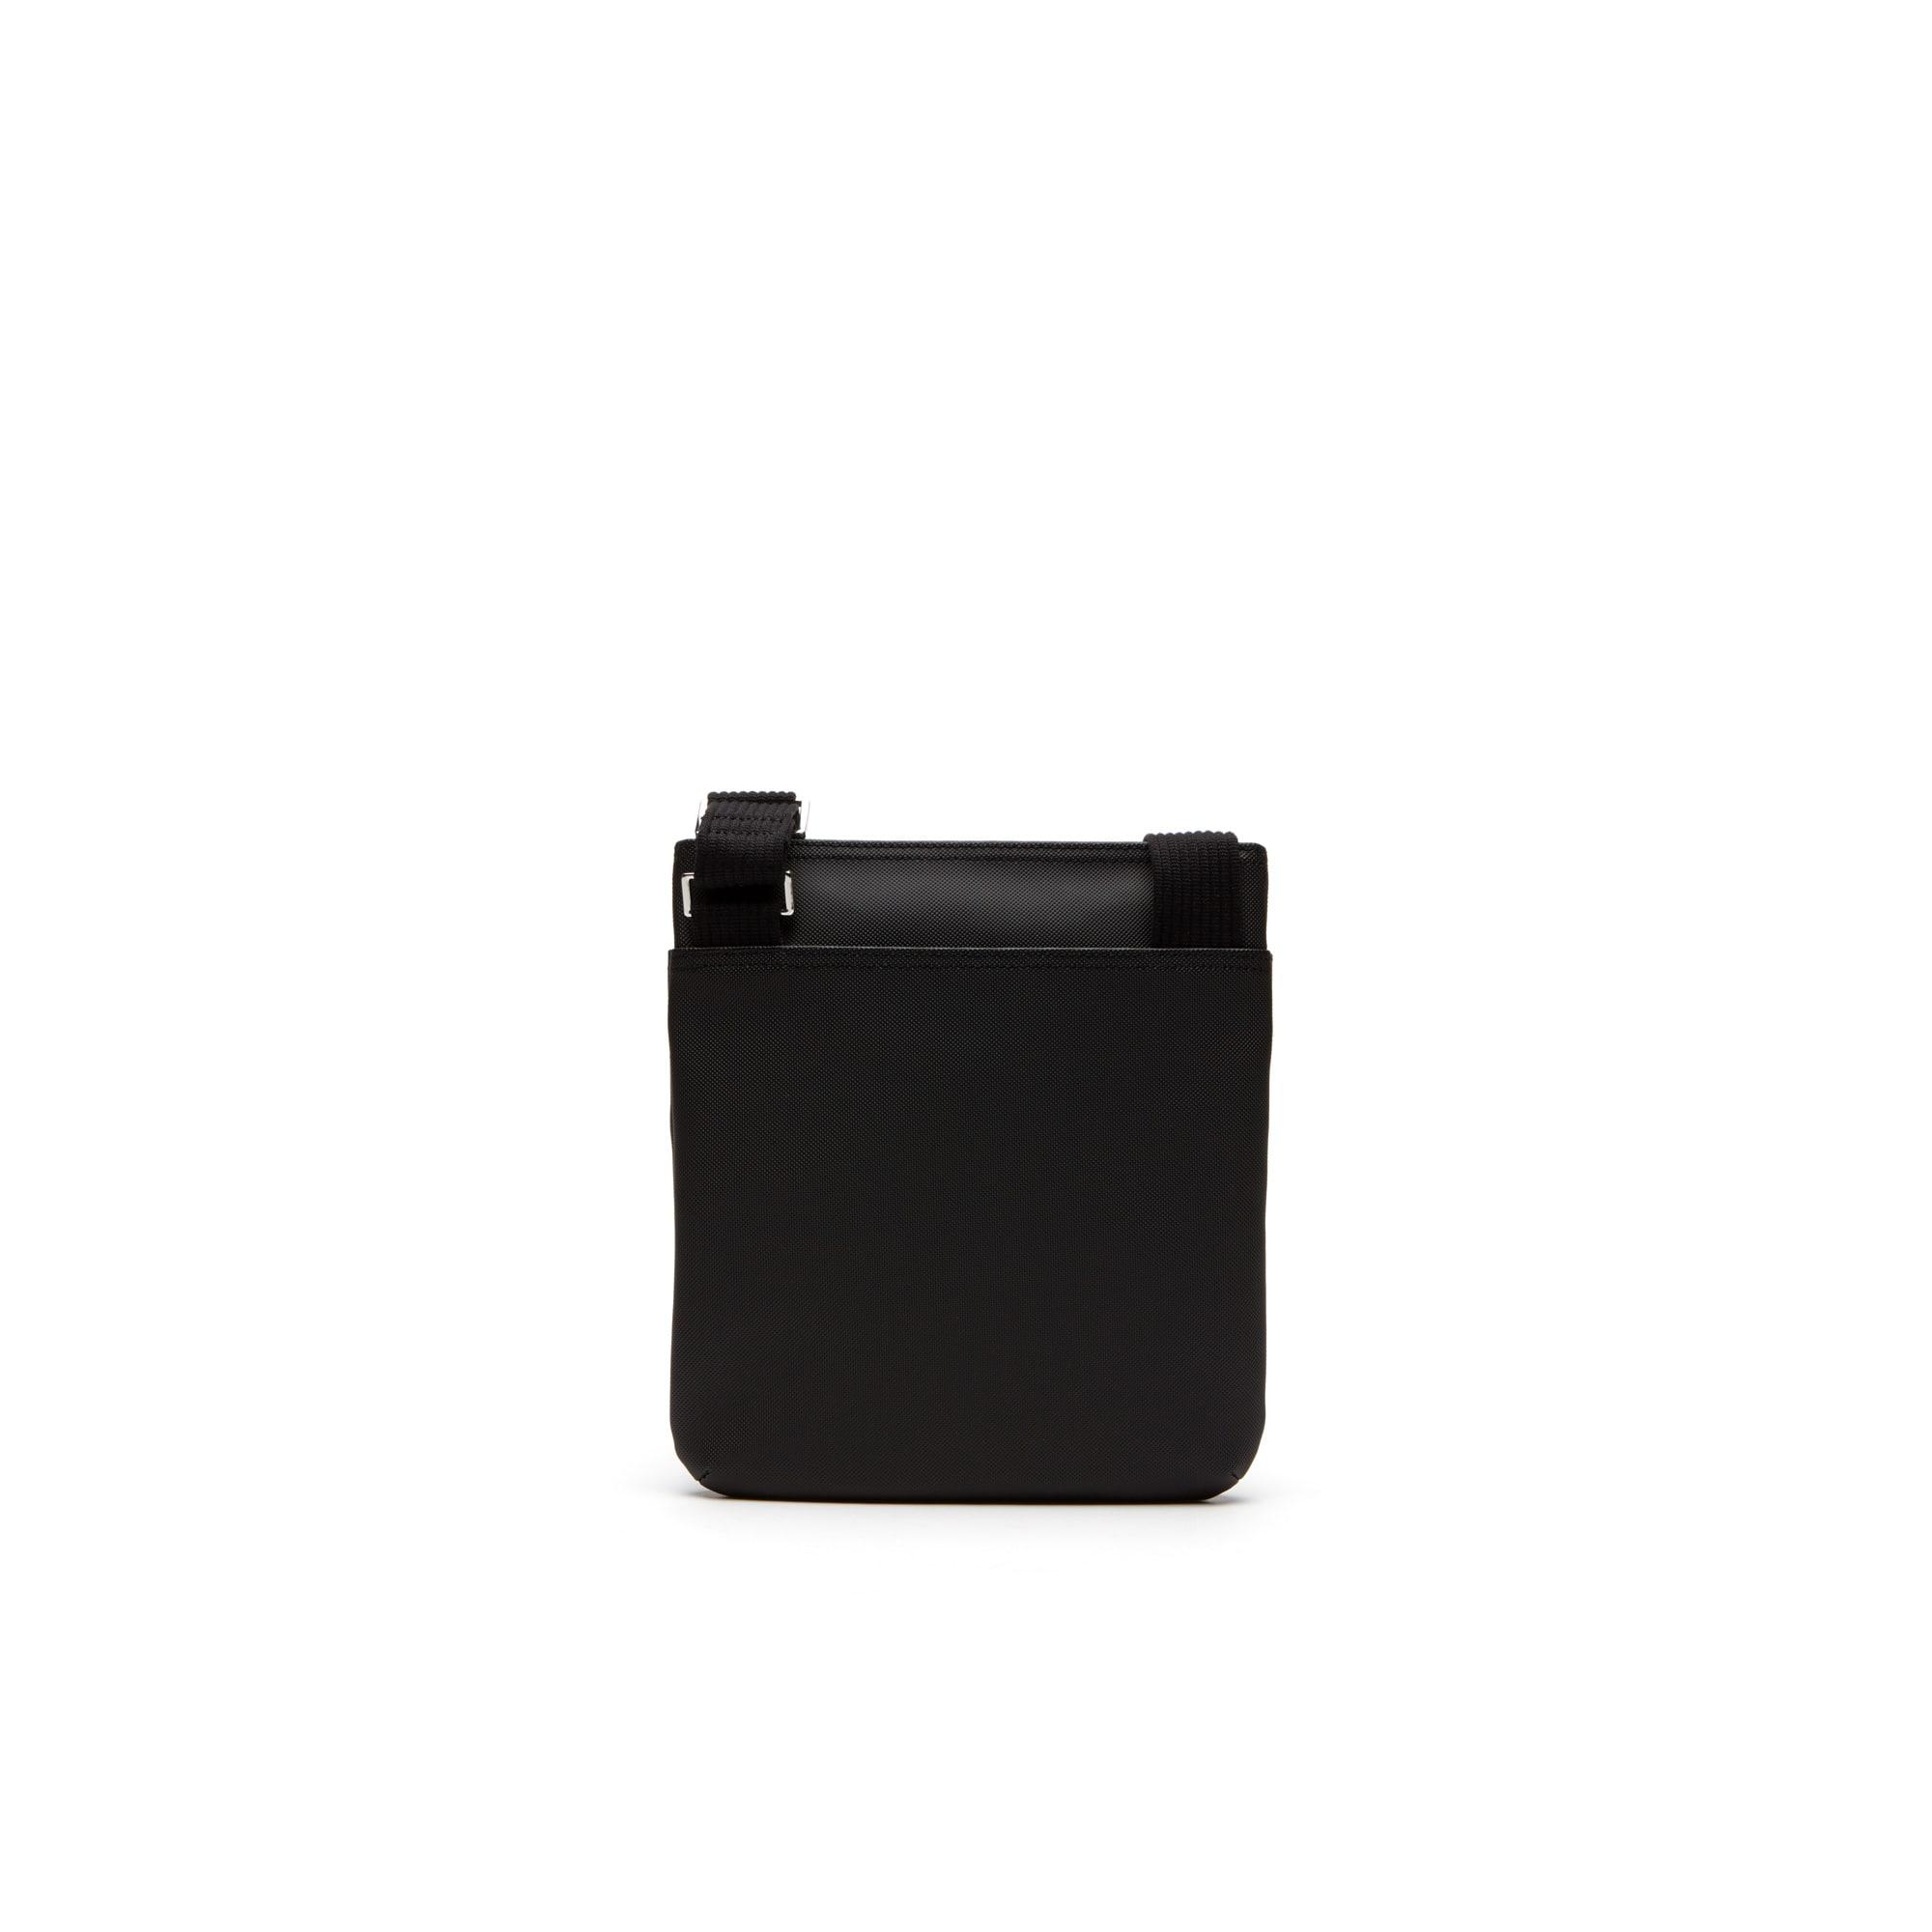 Lacoste - Flache Herren-Tasche CLASSIC aus Petit Piqué - 2